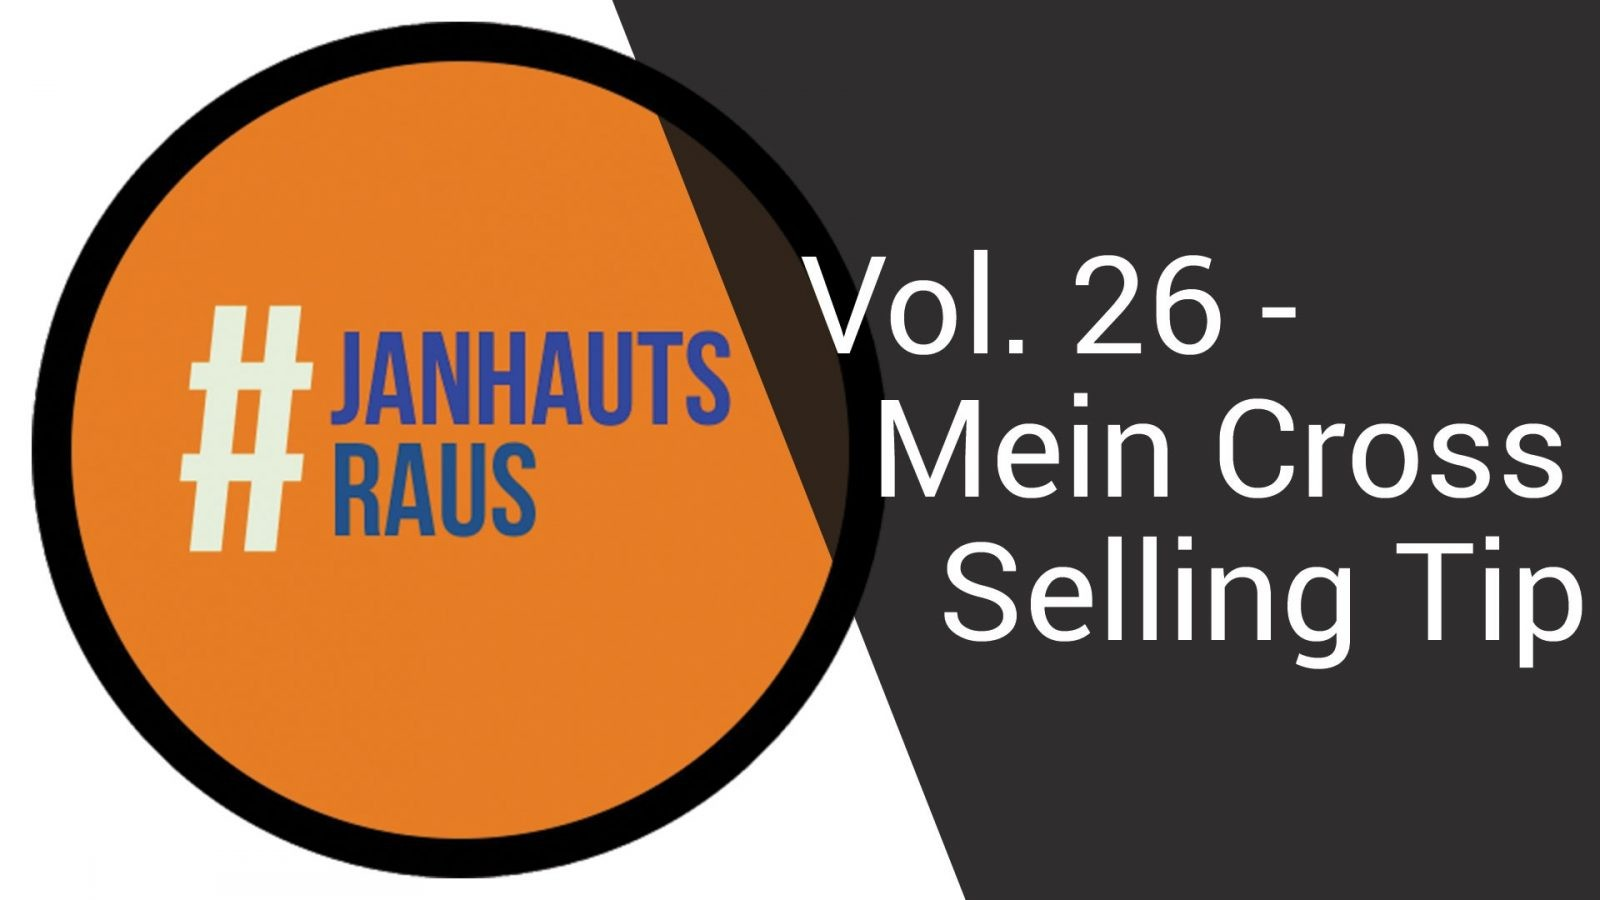 #janhautsraus - Vol. 26 - Mein Cross-Selling Tipp